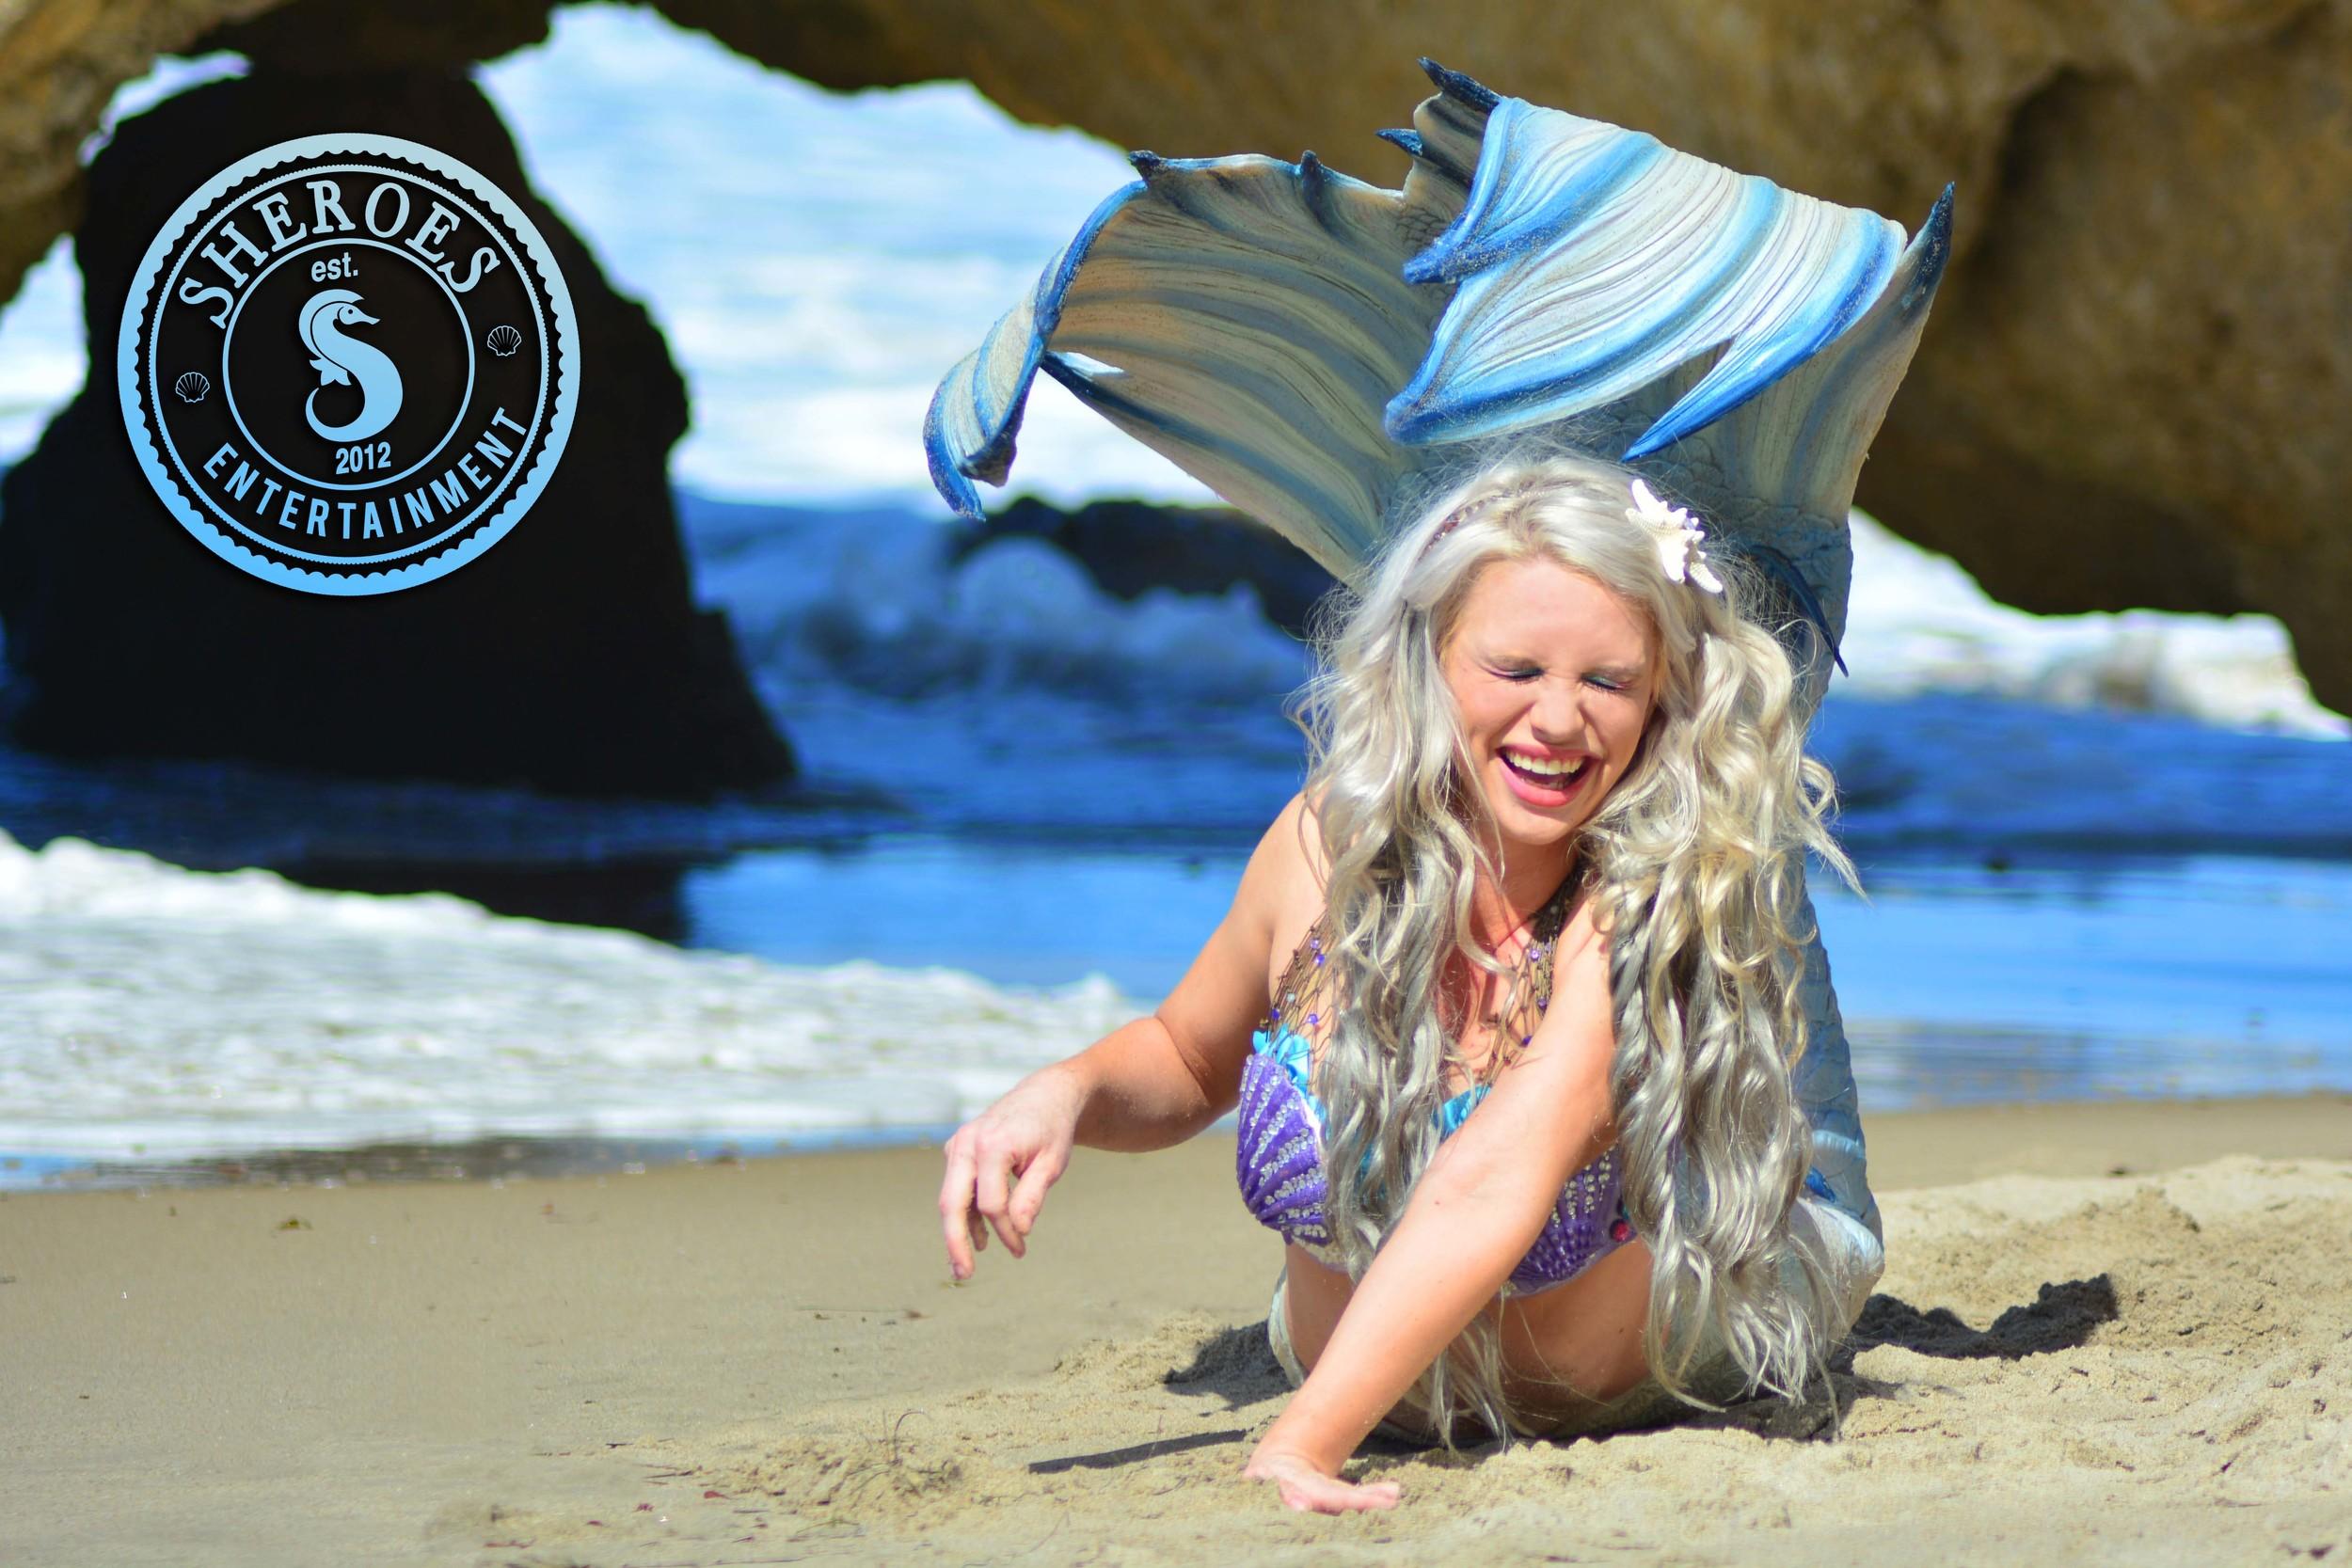 Mermaid Splash 3 - WEB.jpg